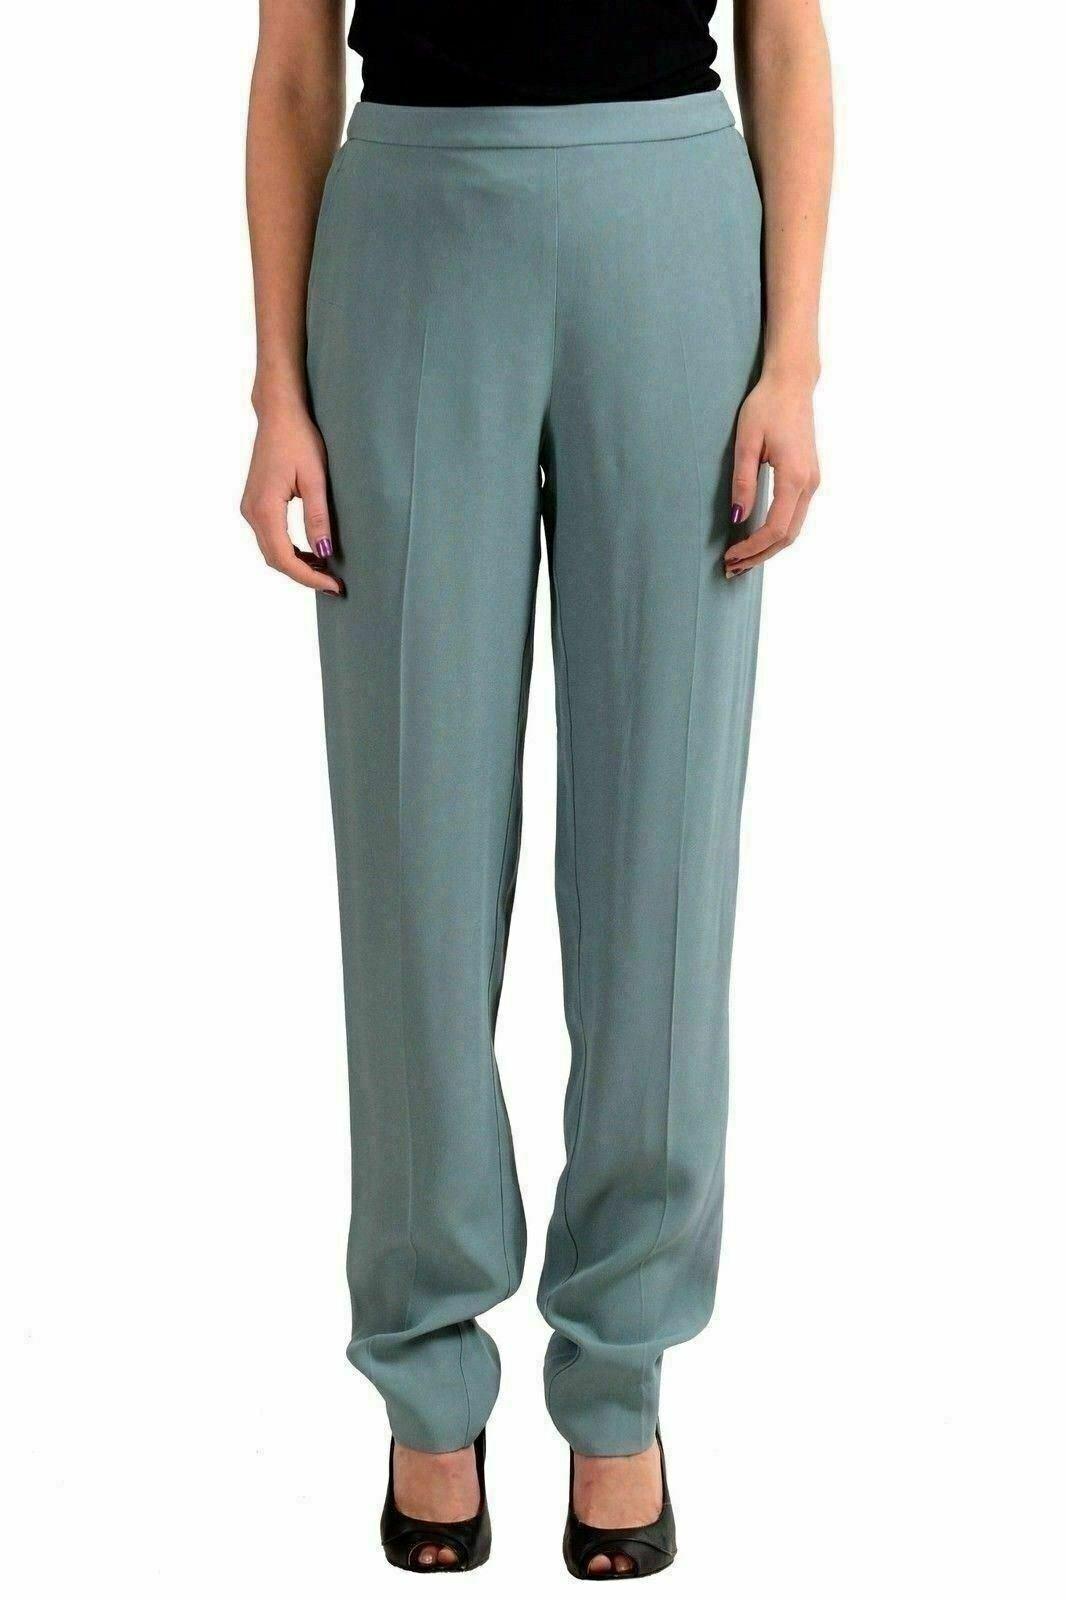 Maison Margiela 4 Light Green Woman's Casual Pants US M IT 42